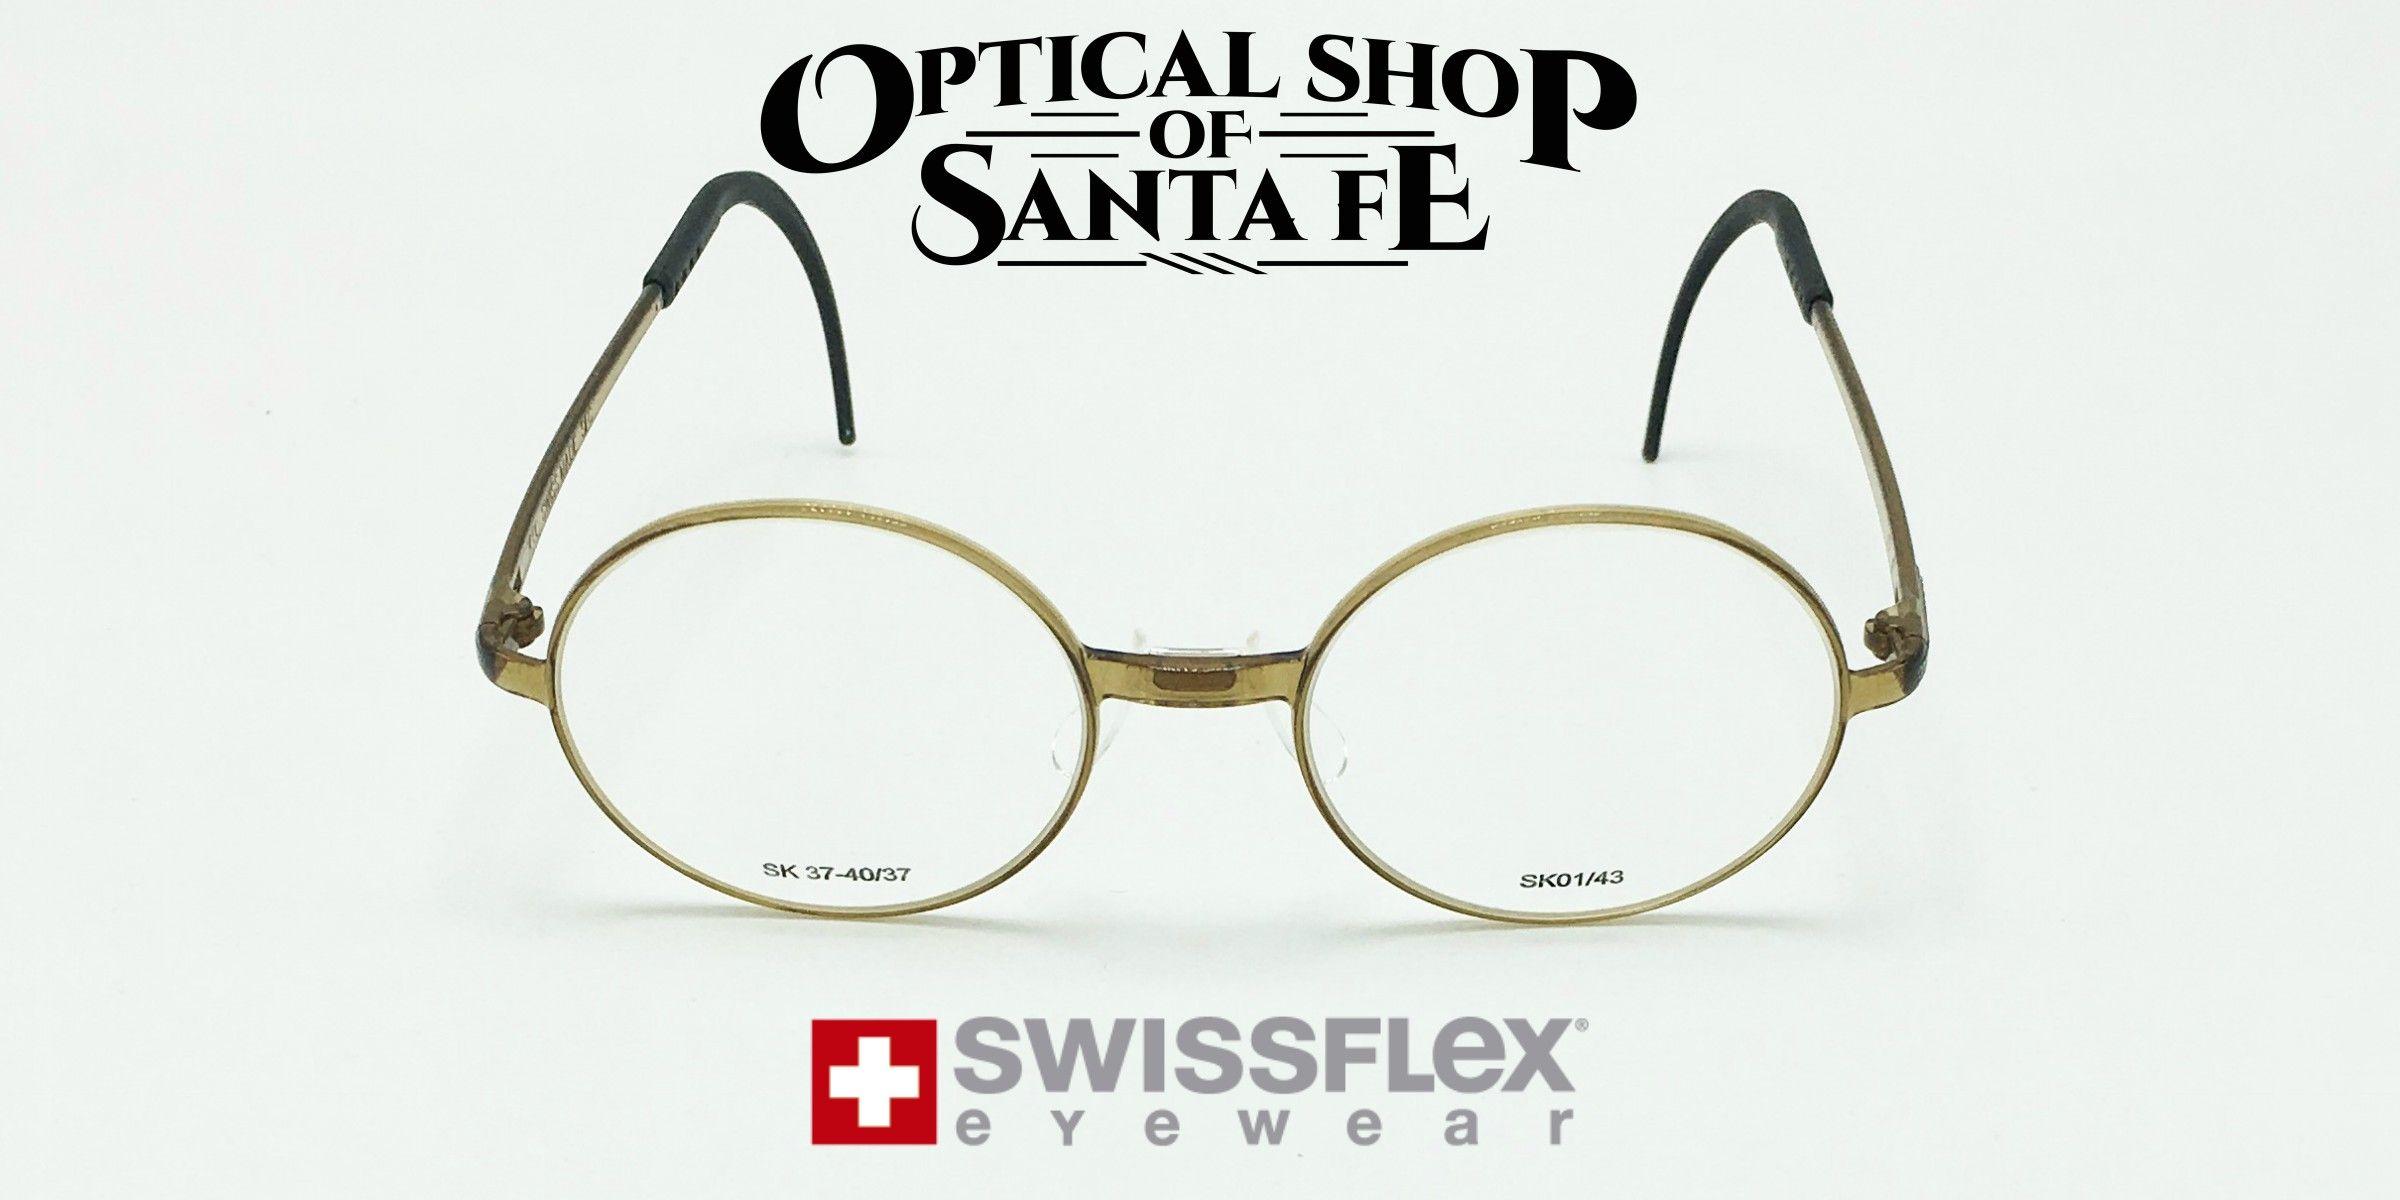 7b4dbb4ecb SWISSFLEX Eyewear